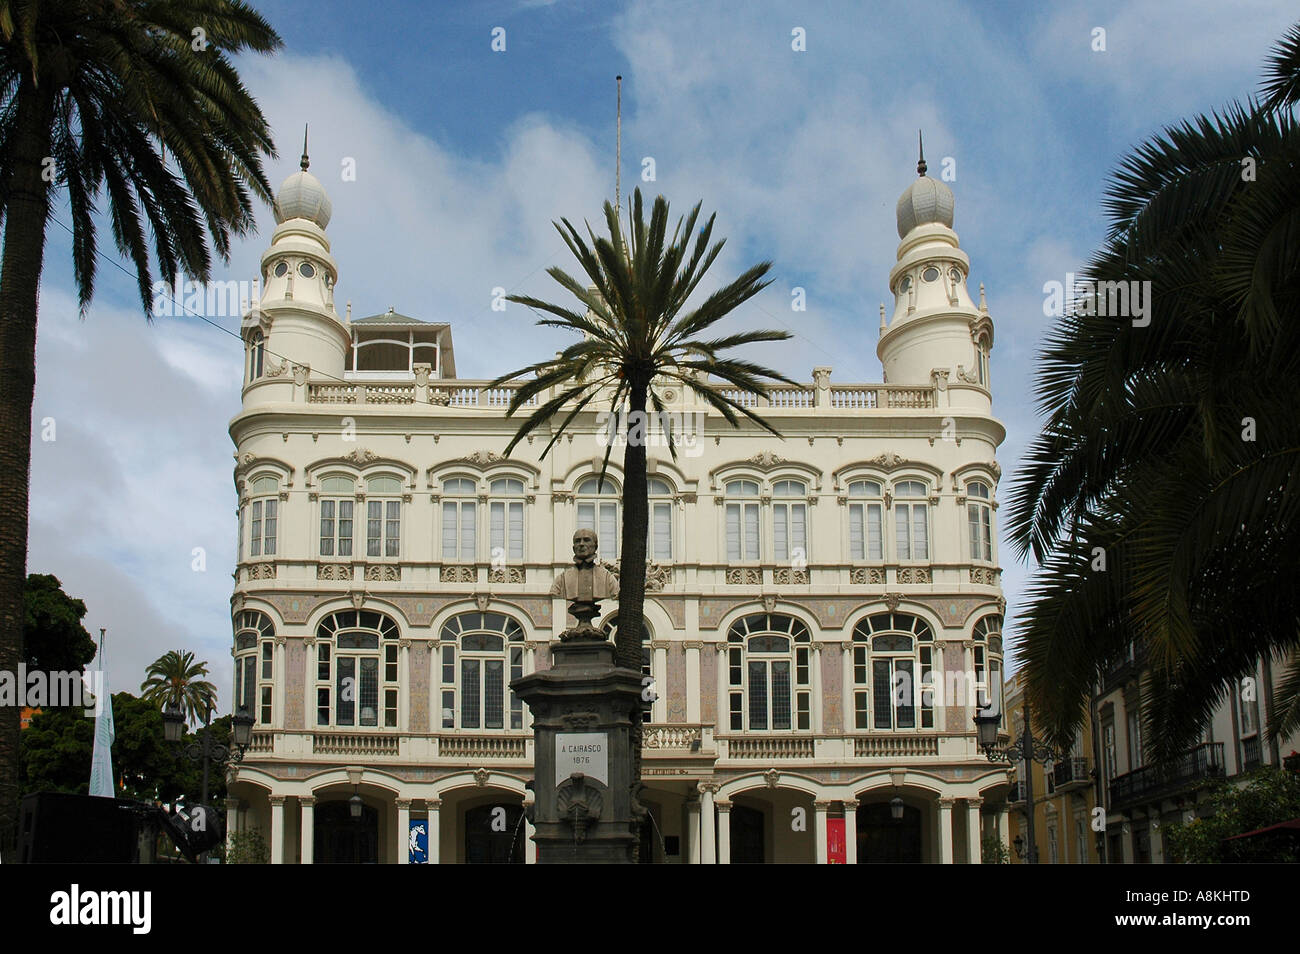 The gabinete literario or literary cabinet building in for Design hotel las palmas gran canaria